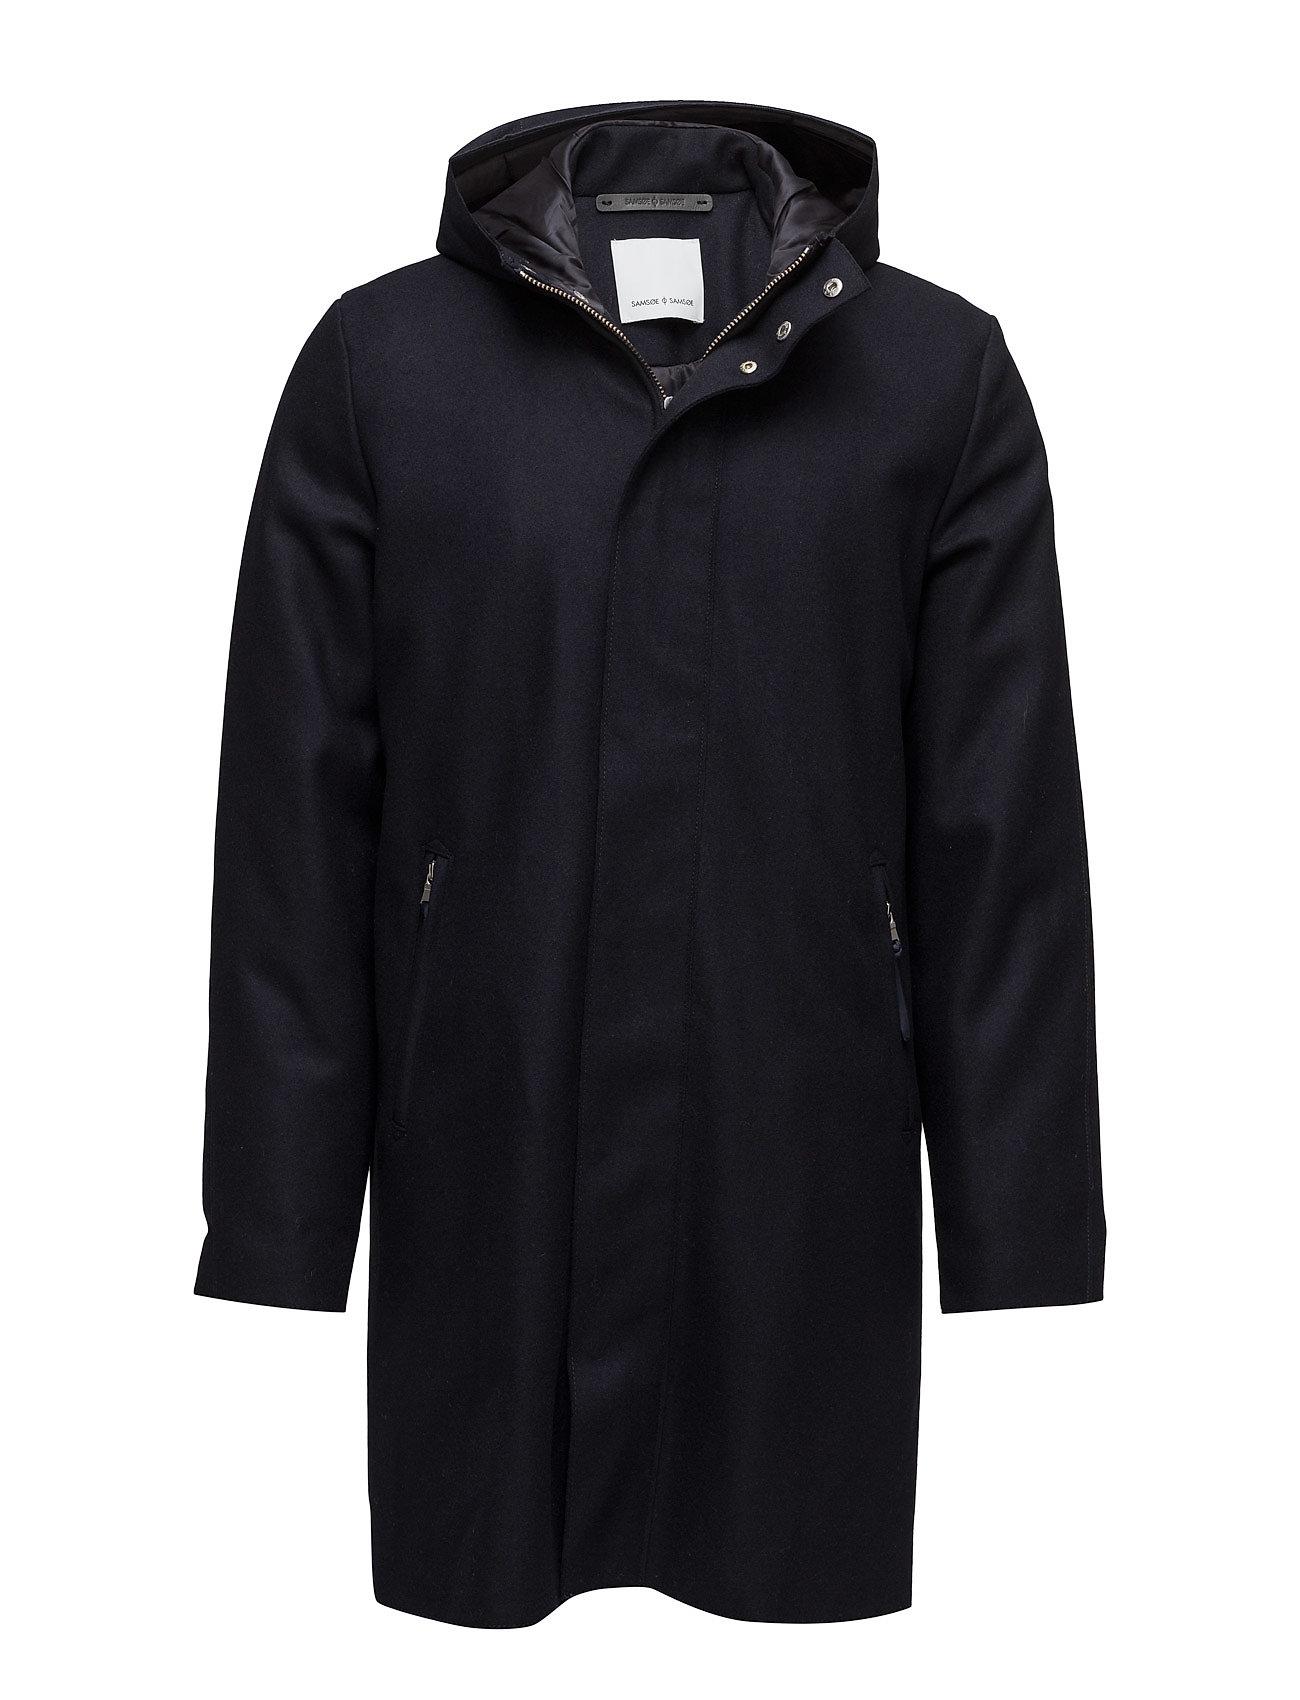 Samsøe & Samsøe Snyder x jacket 7185